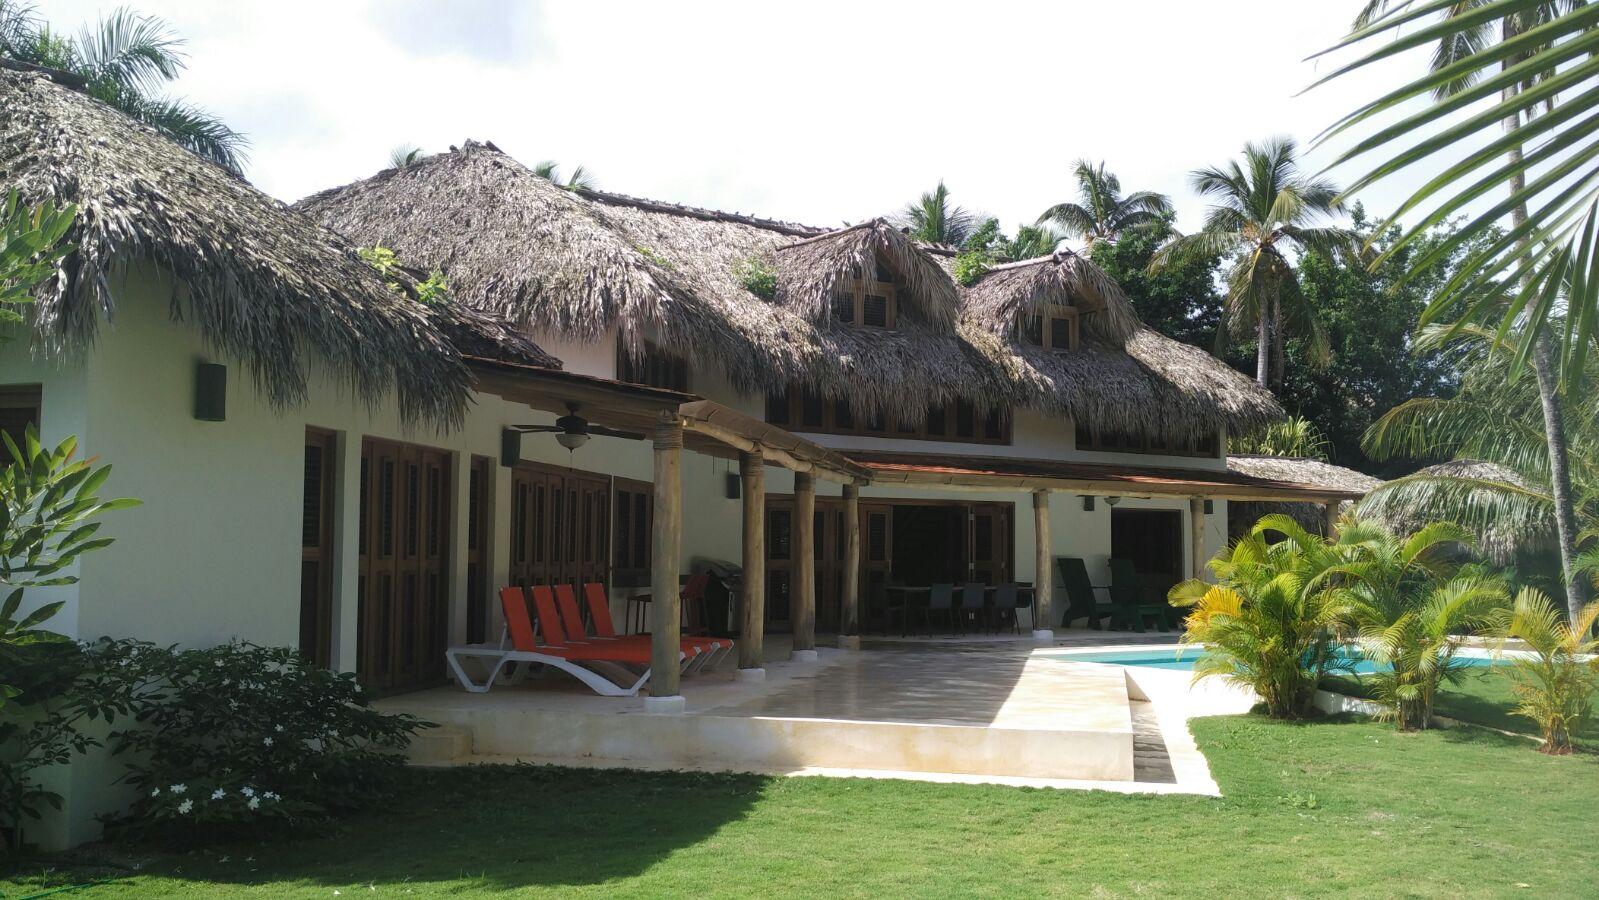 Villa for rent Las Terrenas Cote ci cote la4.jpeg